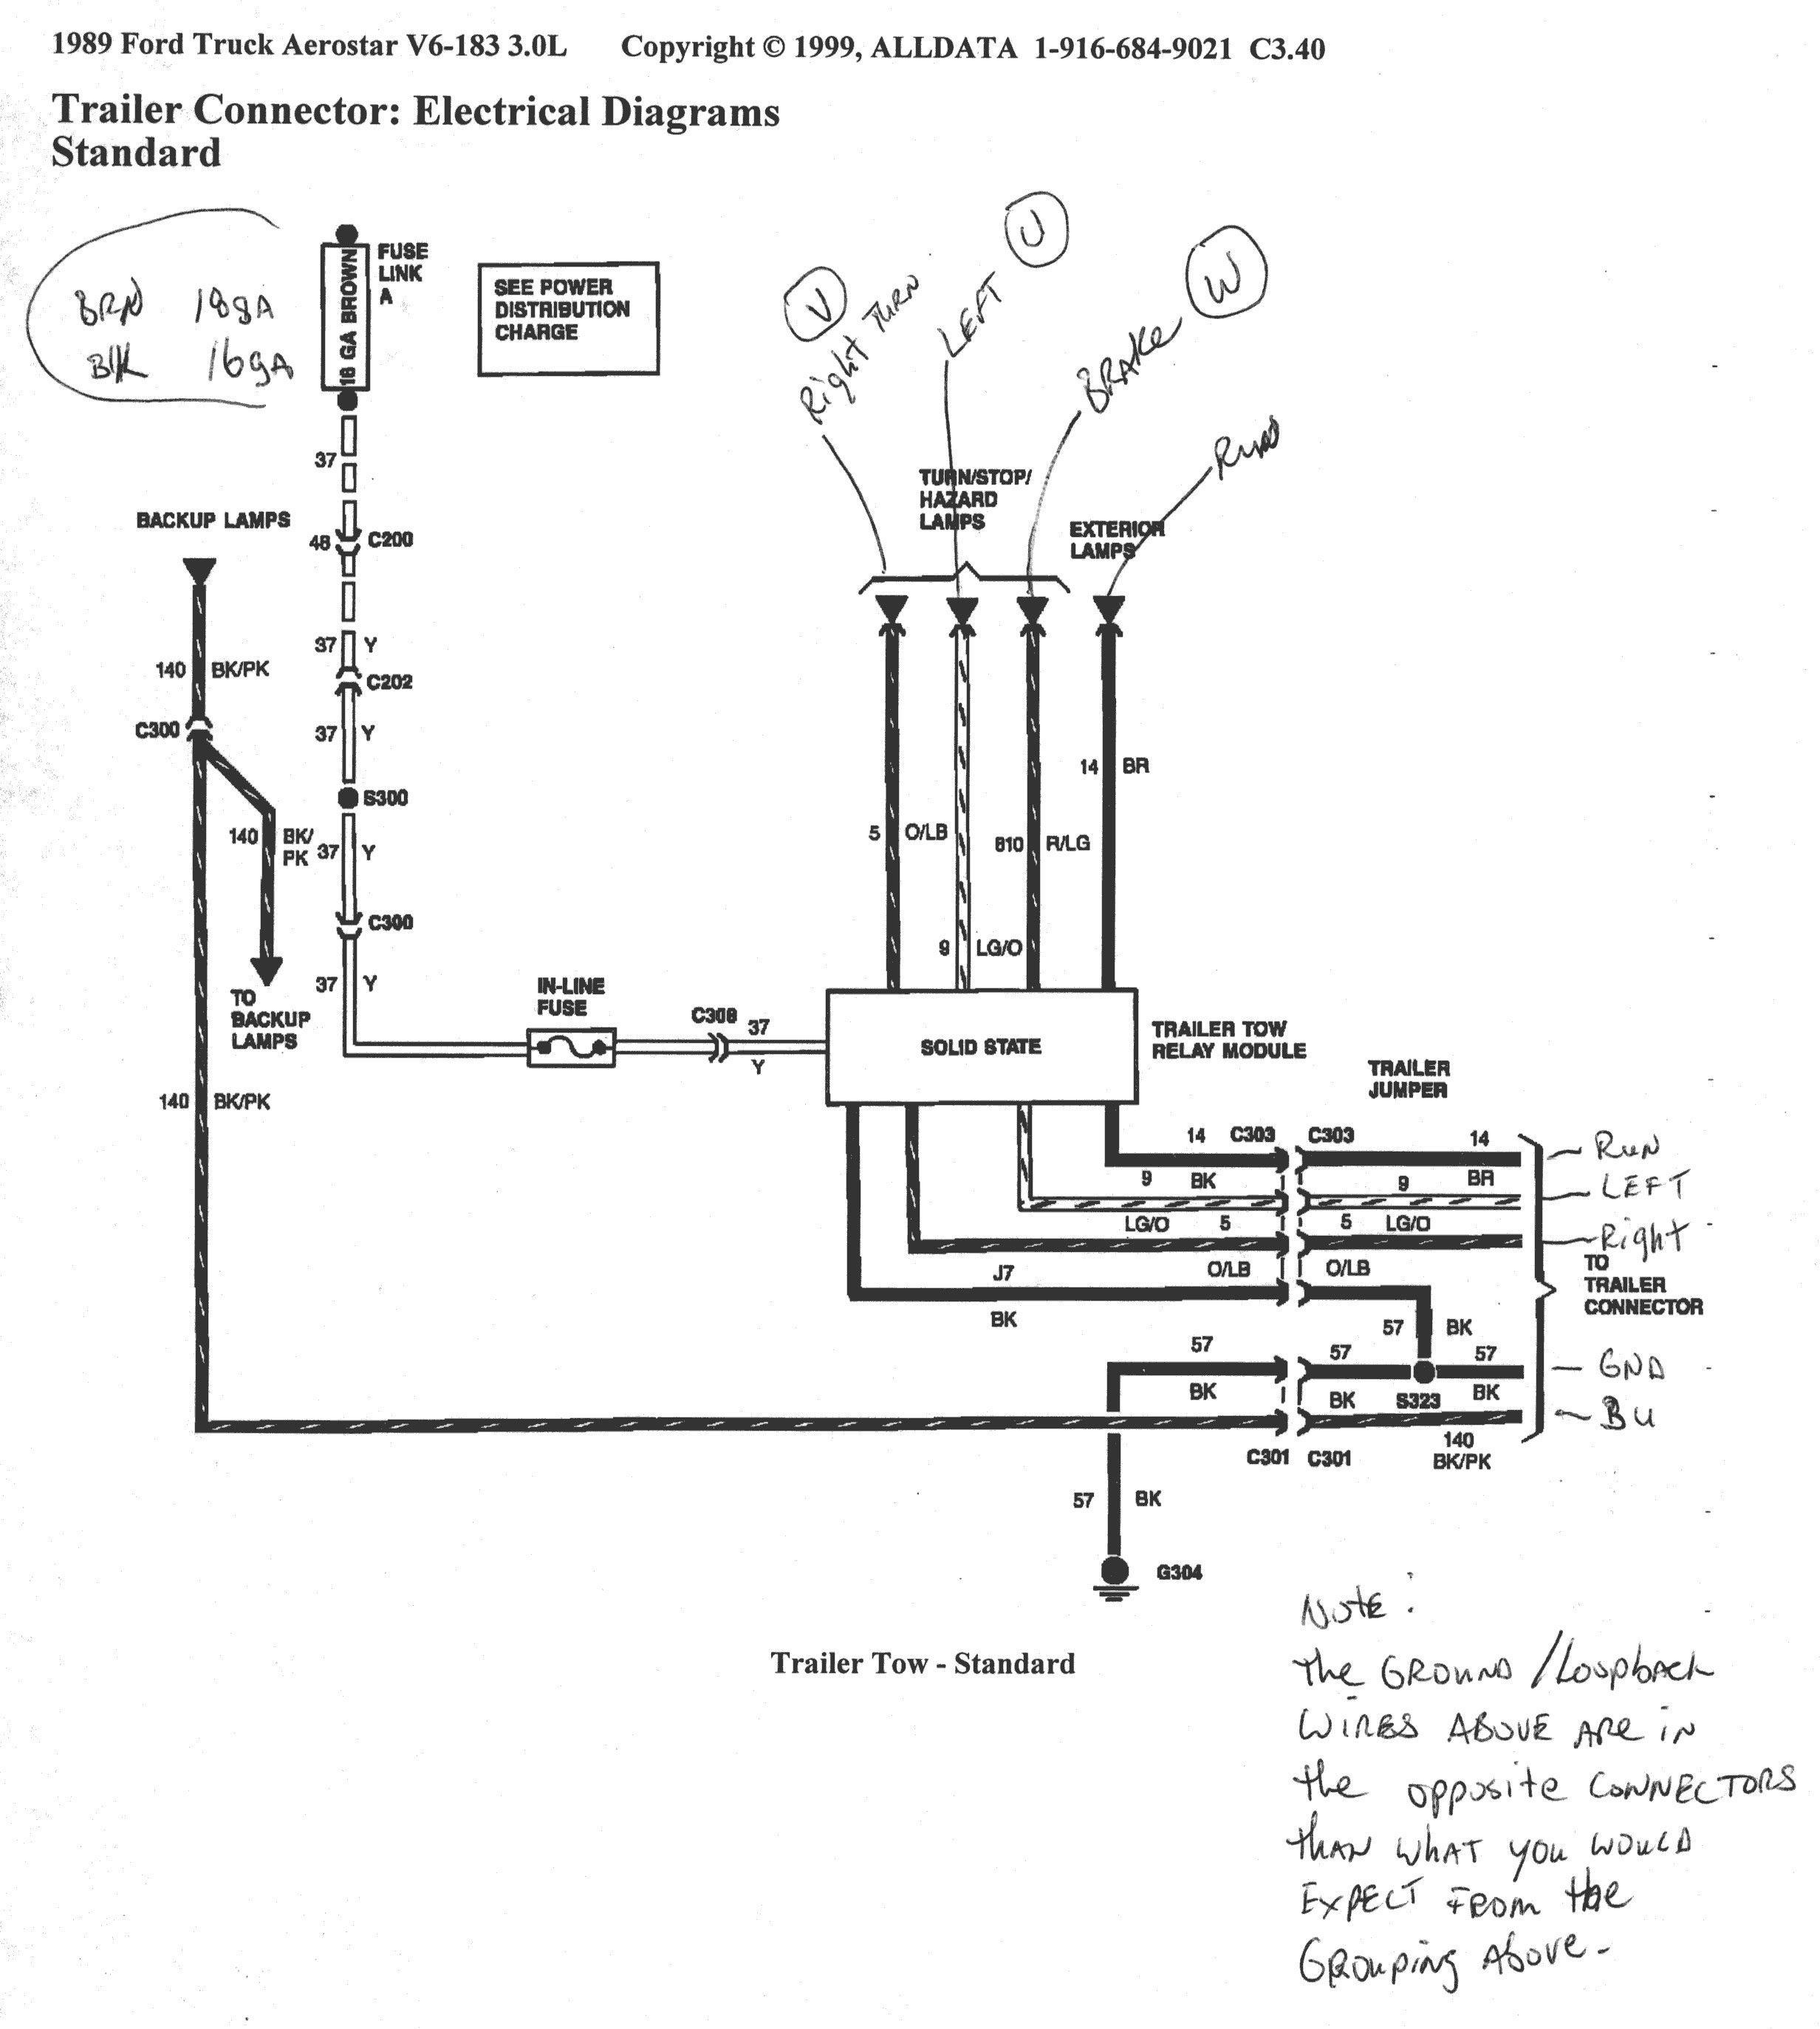 2004 f 350 wiring diagram 2004 f350 trailer light wiring diagram e27 wiring diagram  2004 f350 trailer light wiring diagram